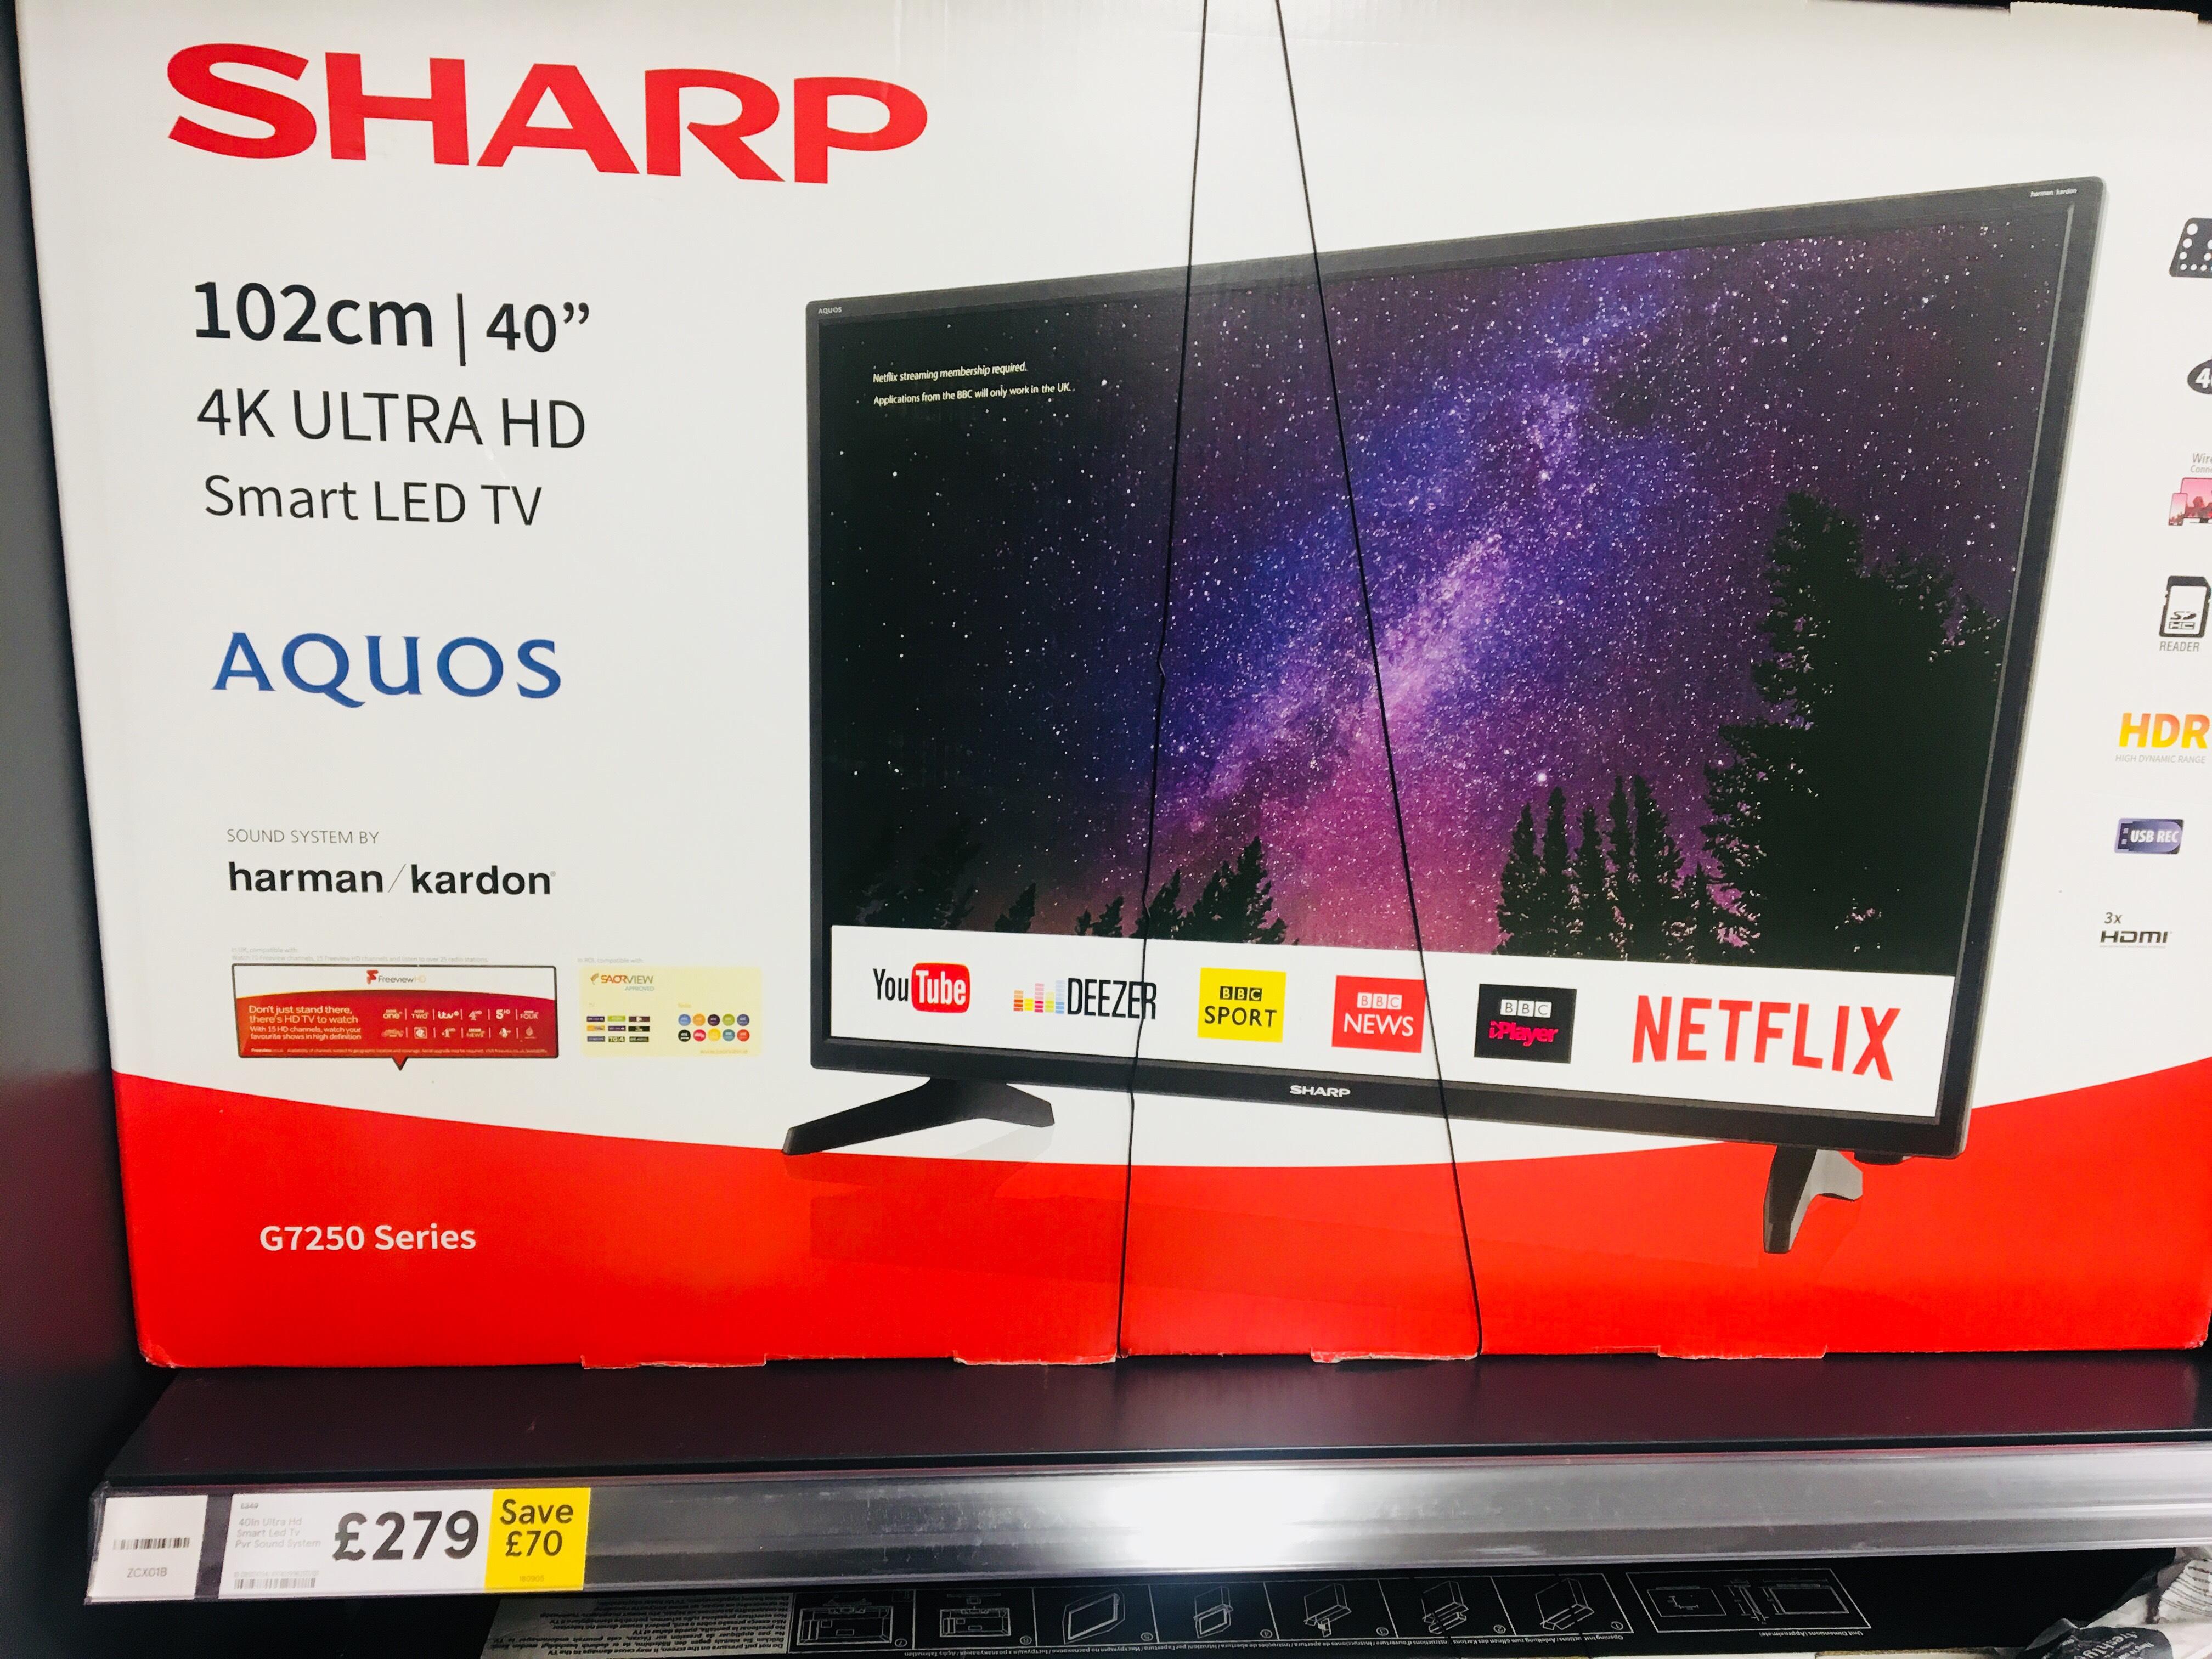 Sharp Aquos G7250 40'' 4K UHD  LED TV - £279 instore at Tesco